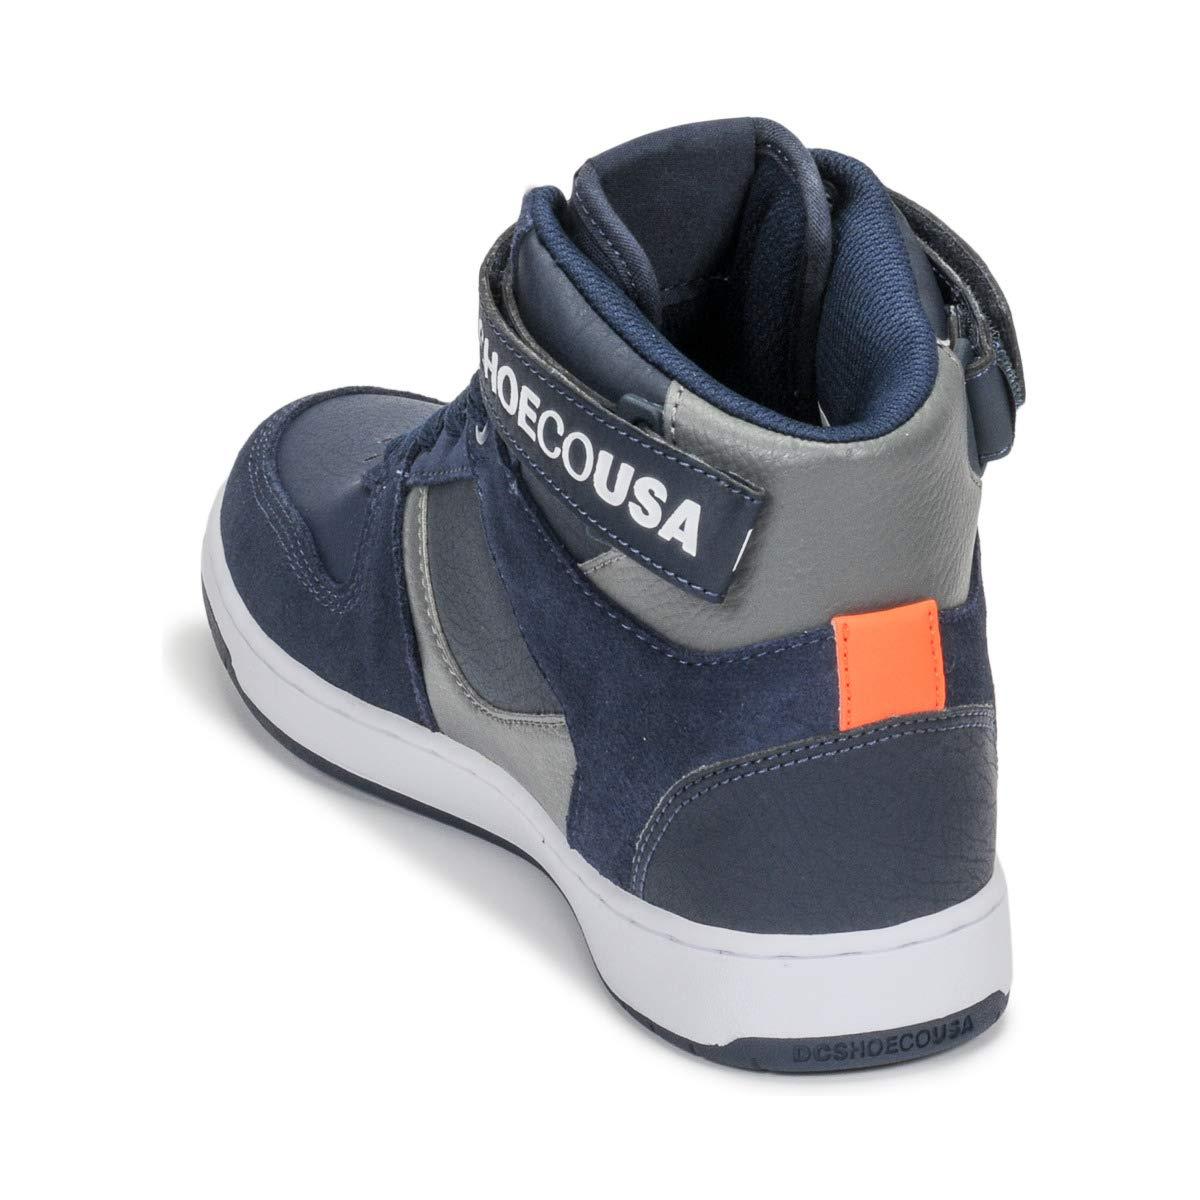 Pensford-High-Top Shoes for Men DCSHI DC Shoes Chaussures de Skateboard Homme